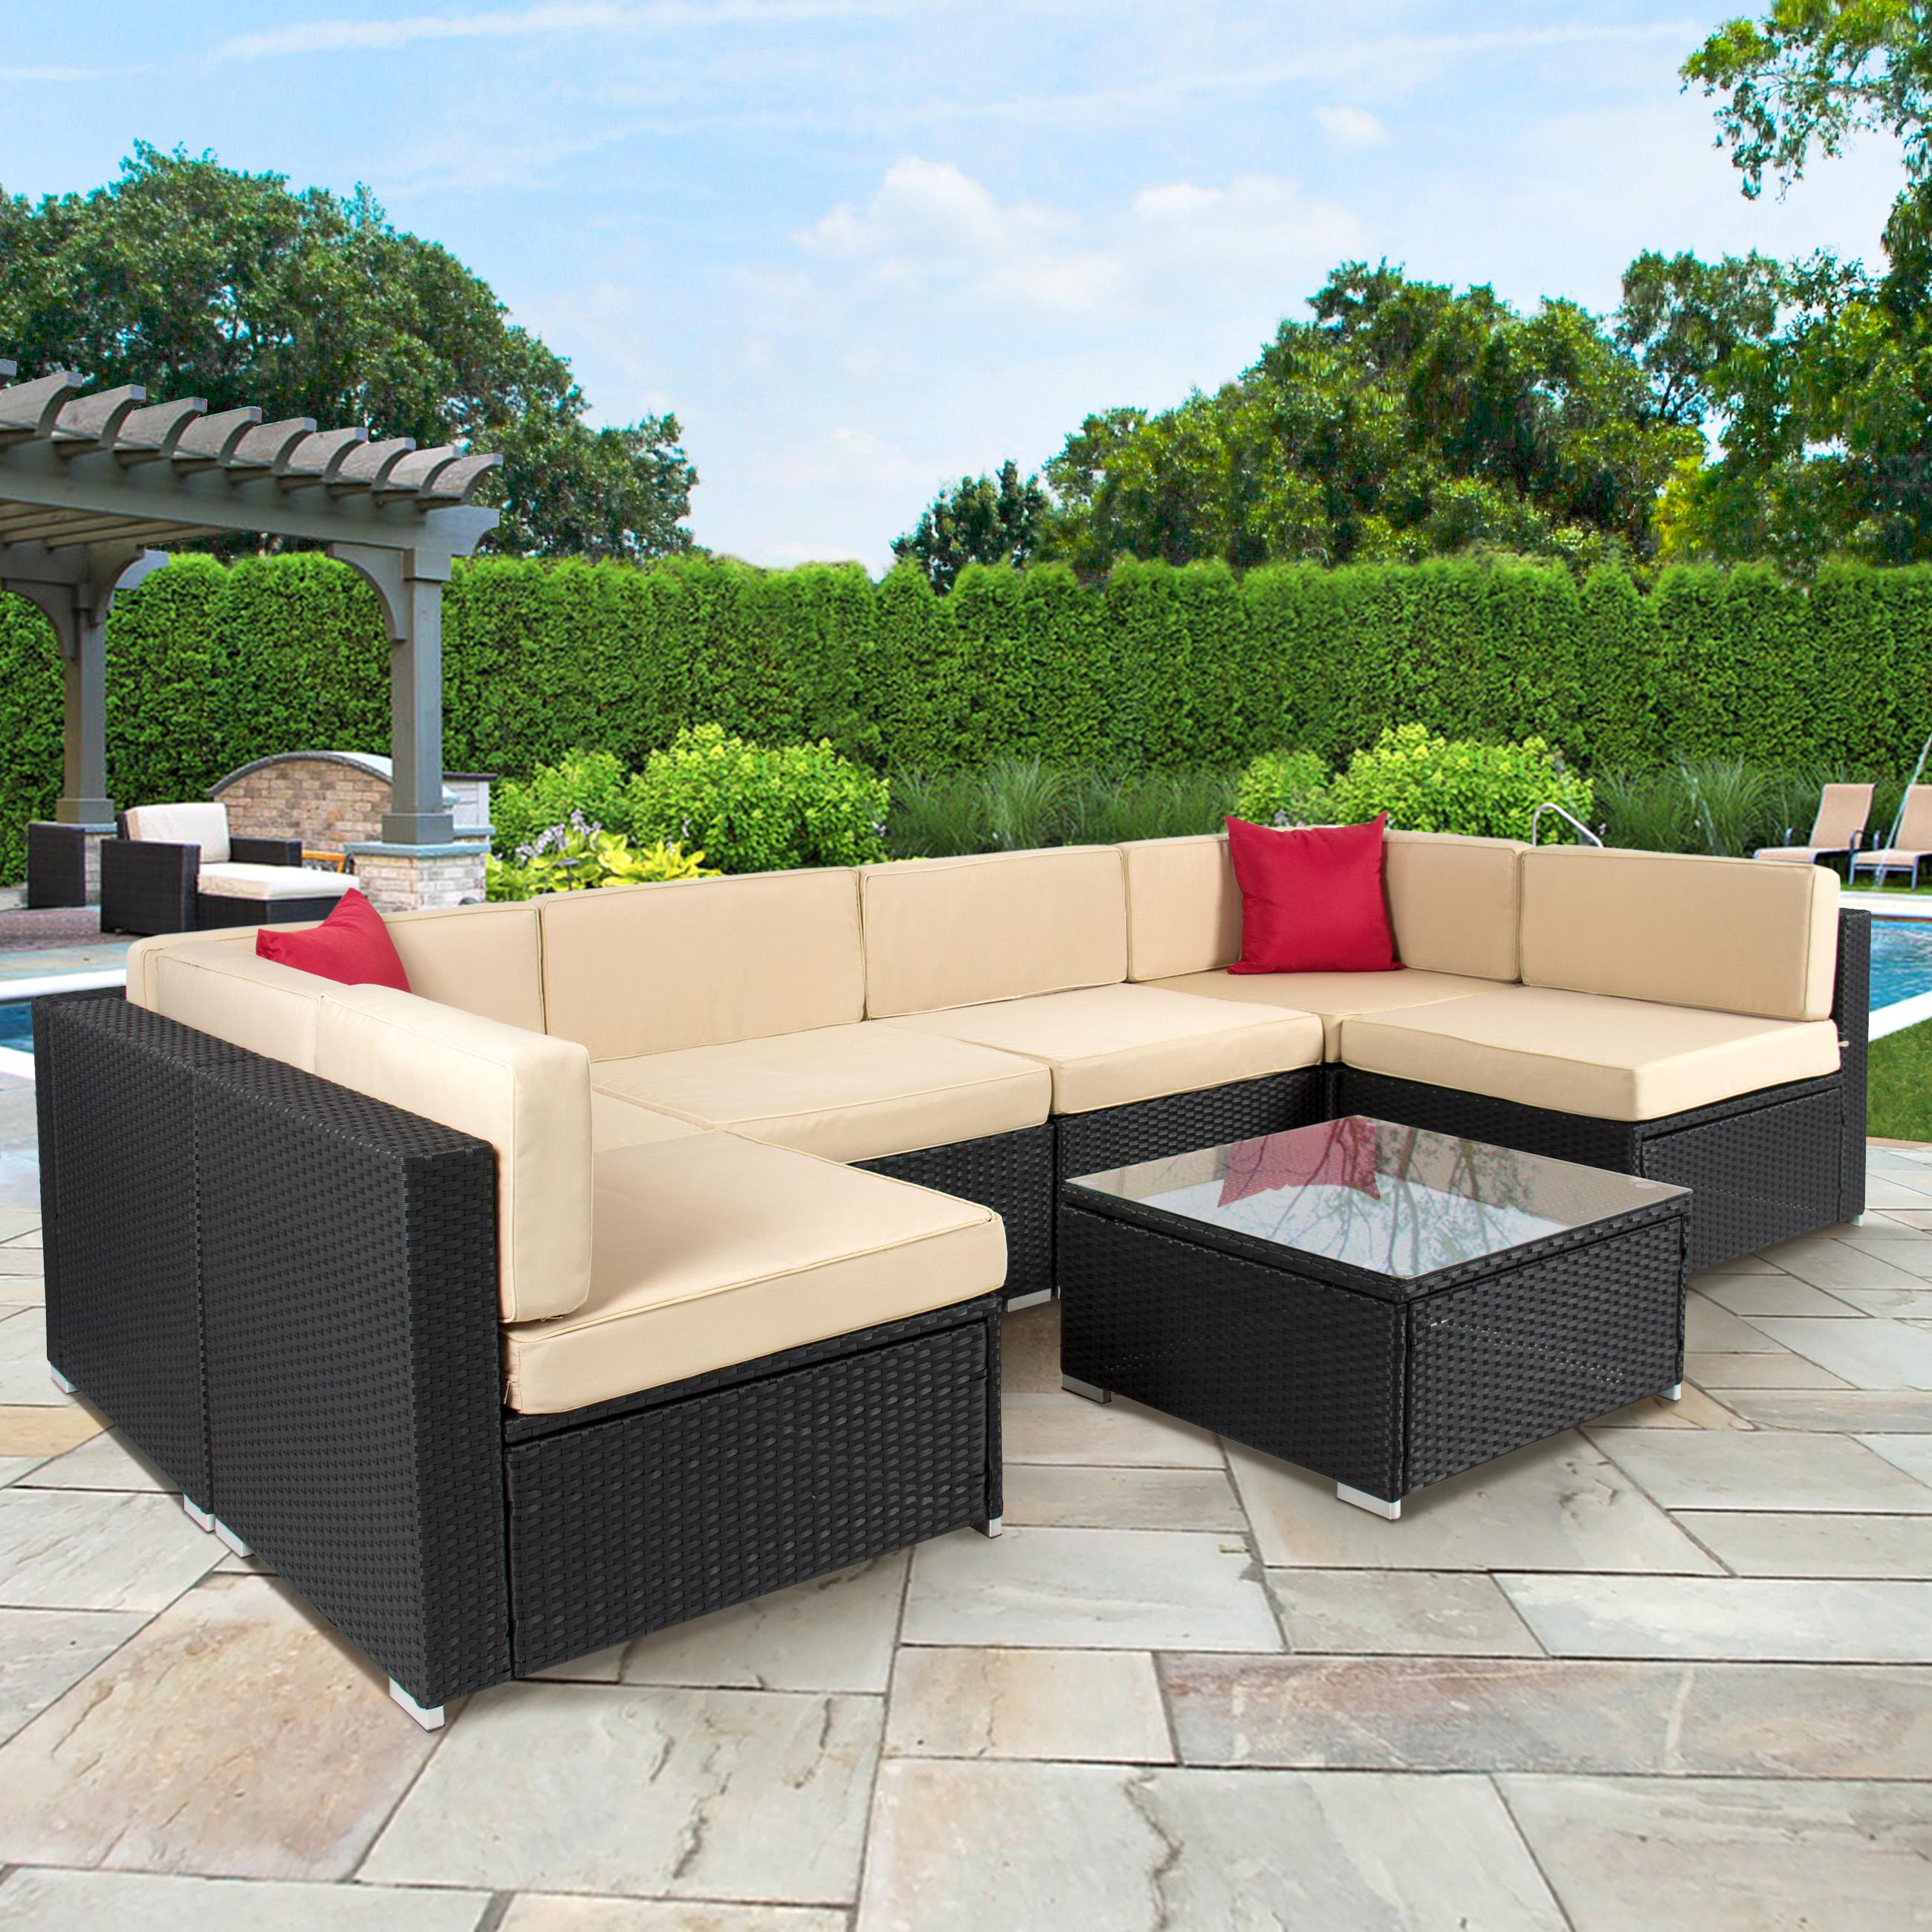 outdoor garden furniture outdoor patio furniture best choice products outdoor garden patio 4pc  cushioned ERSGKMO